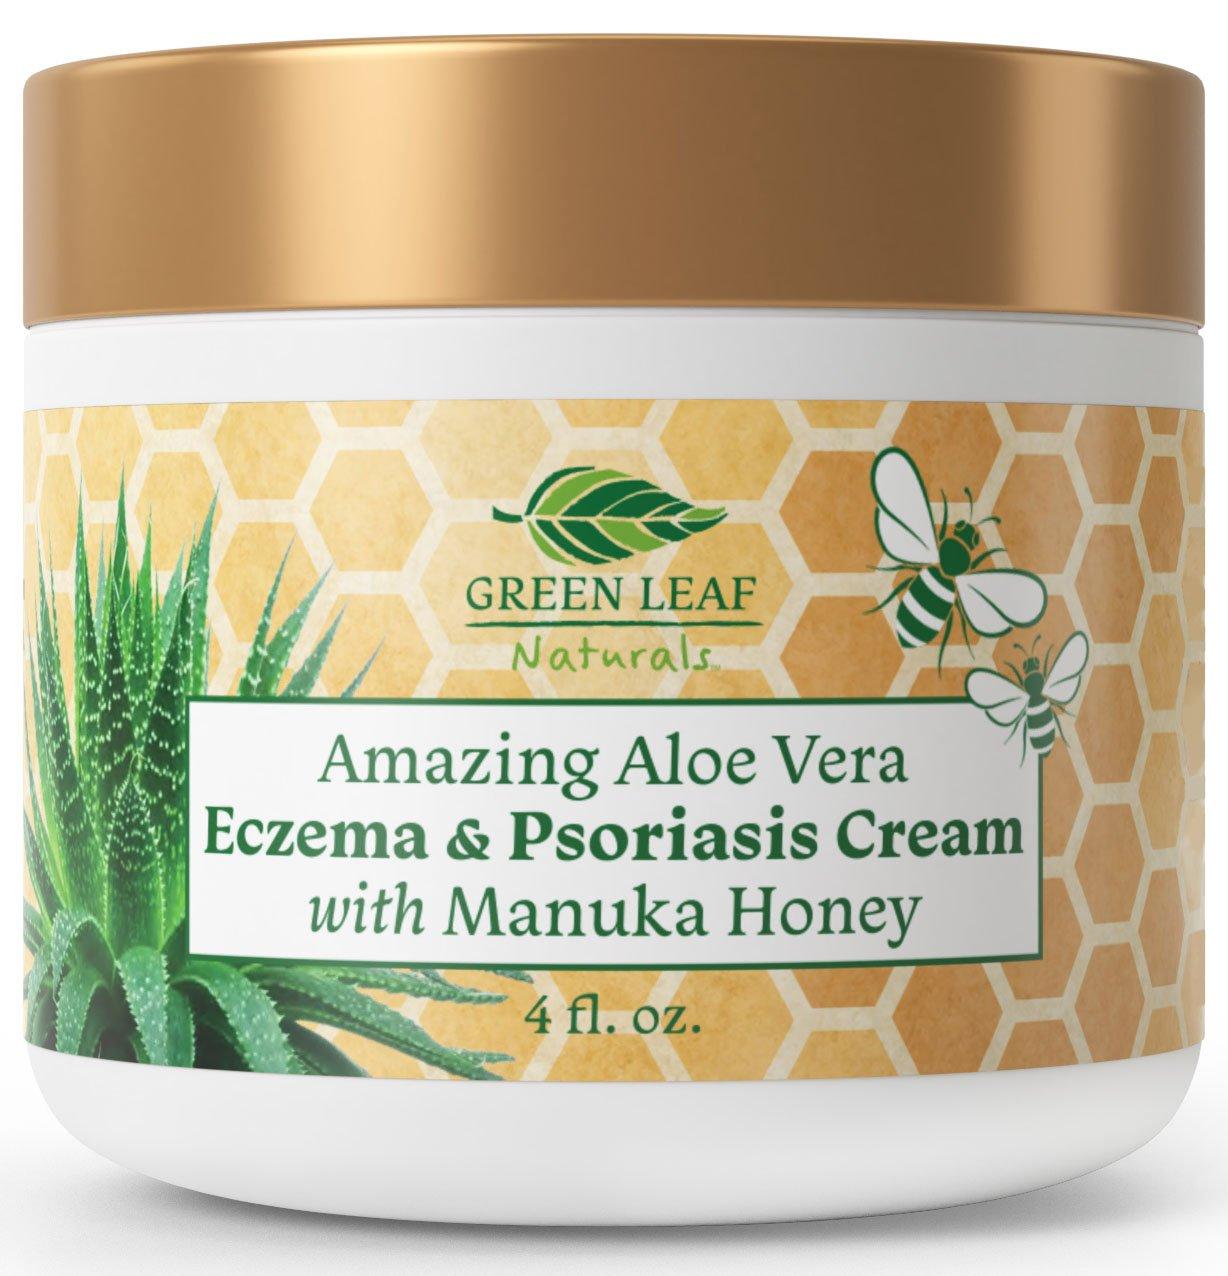 Amazing Aloe Vera Eczema Psoriasis Cream With Manuka Honey Psoriasis Cream Moisturizing Face Cream Moisturizer Cream